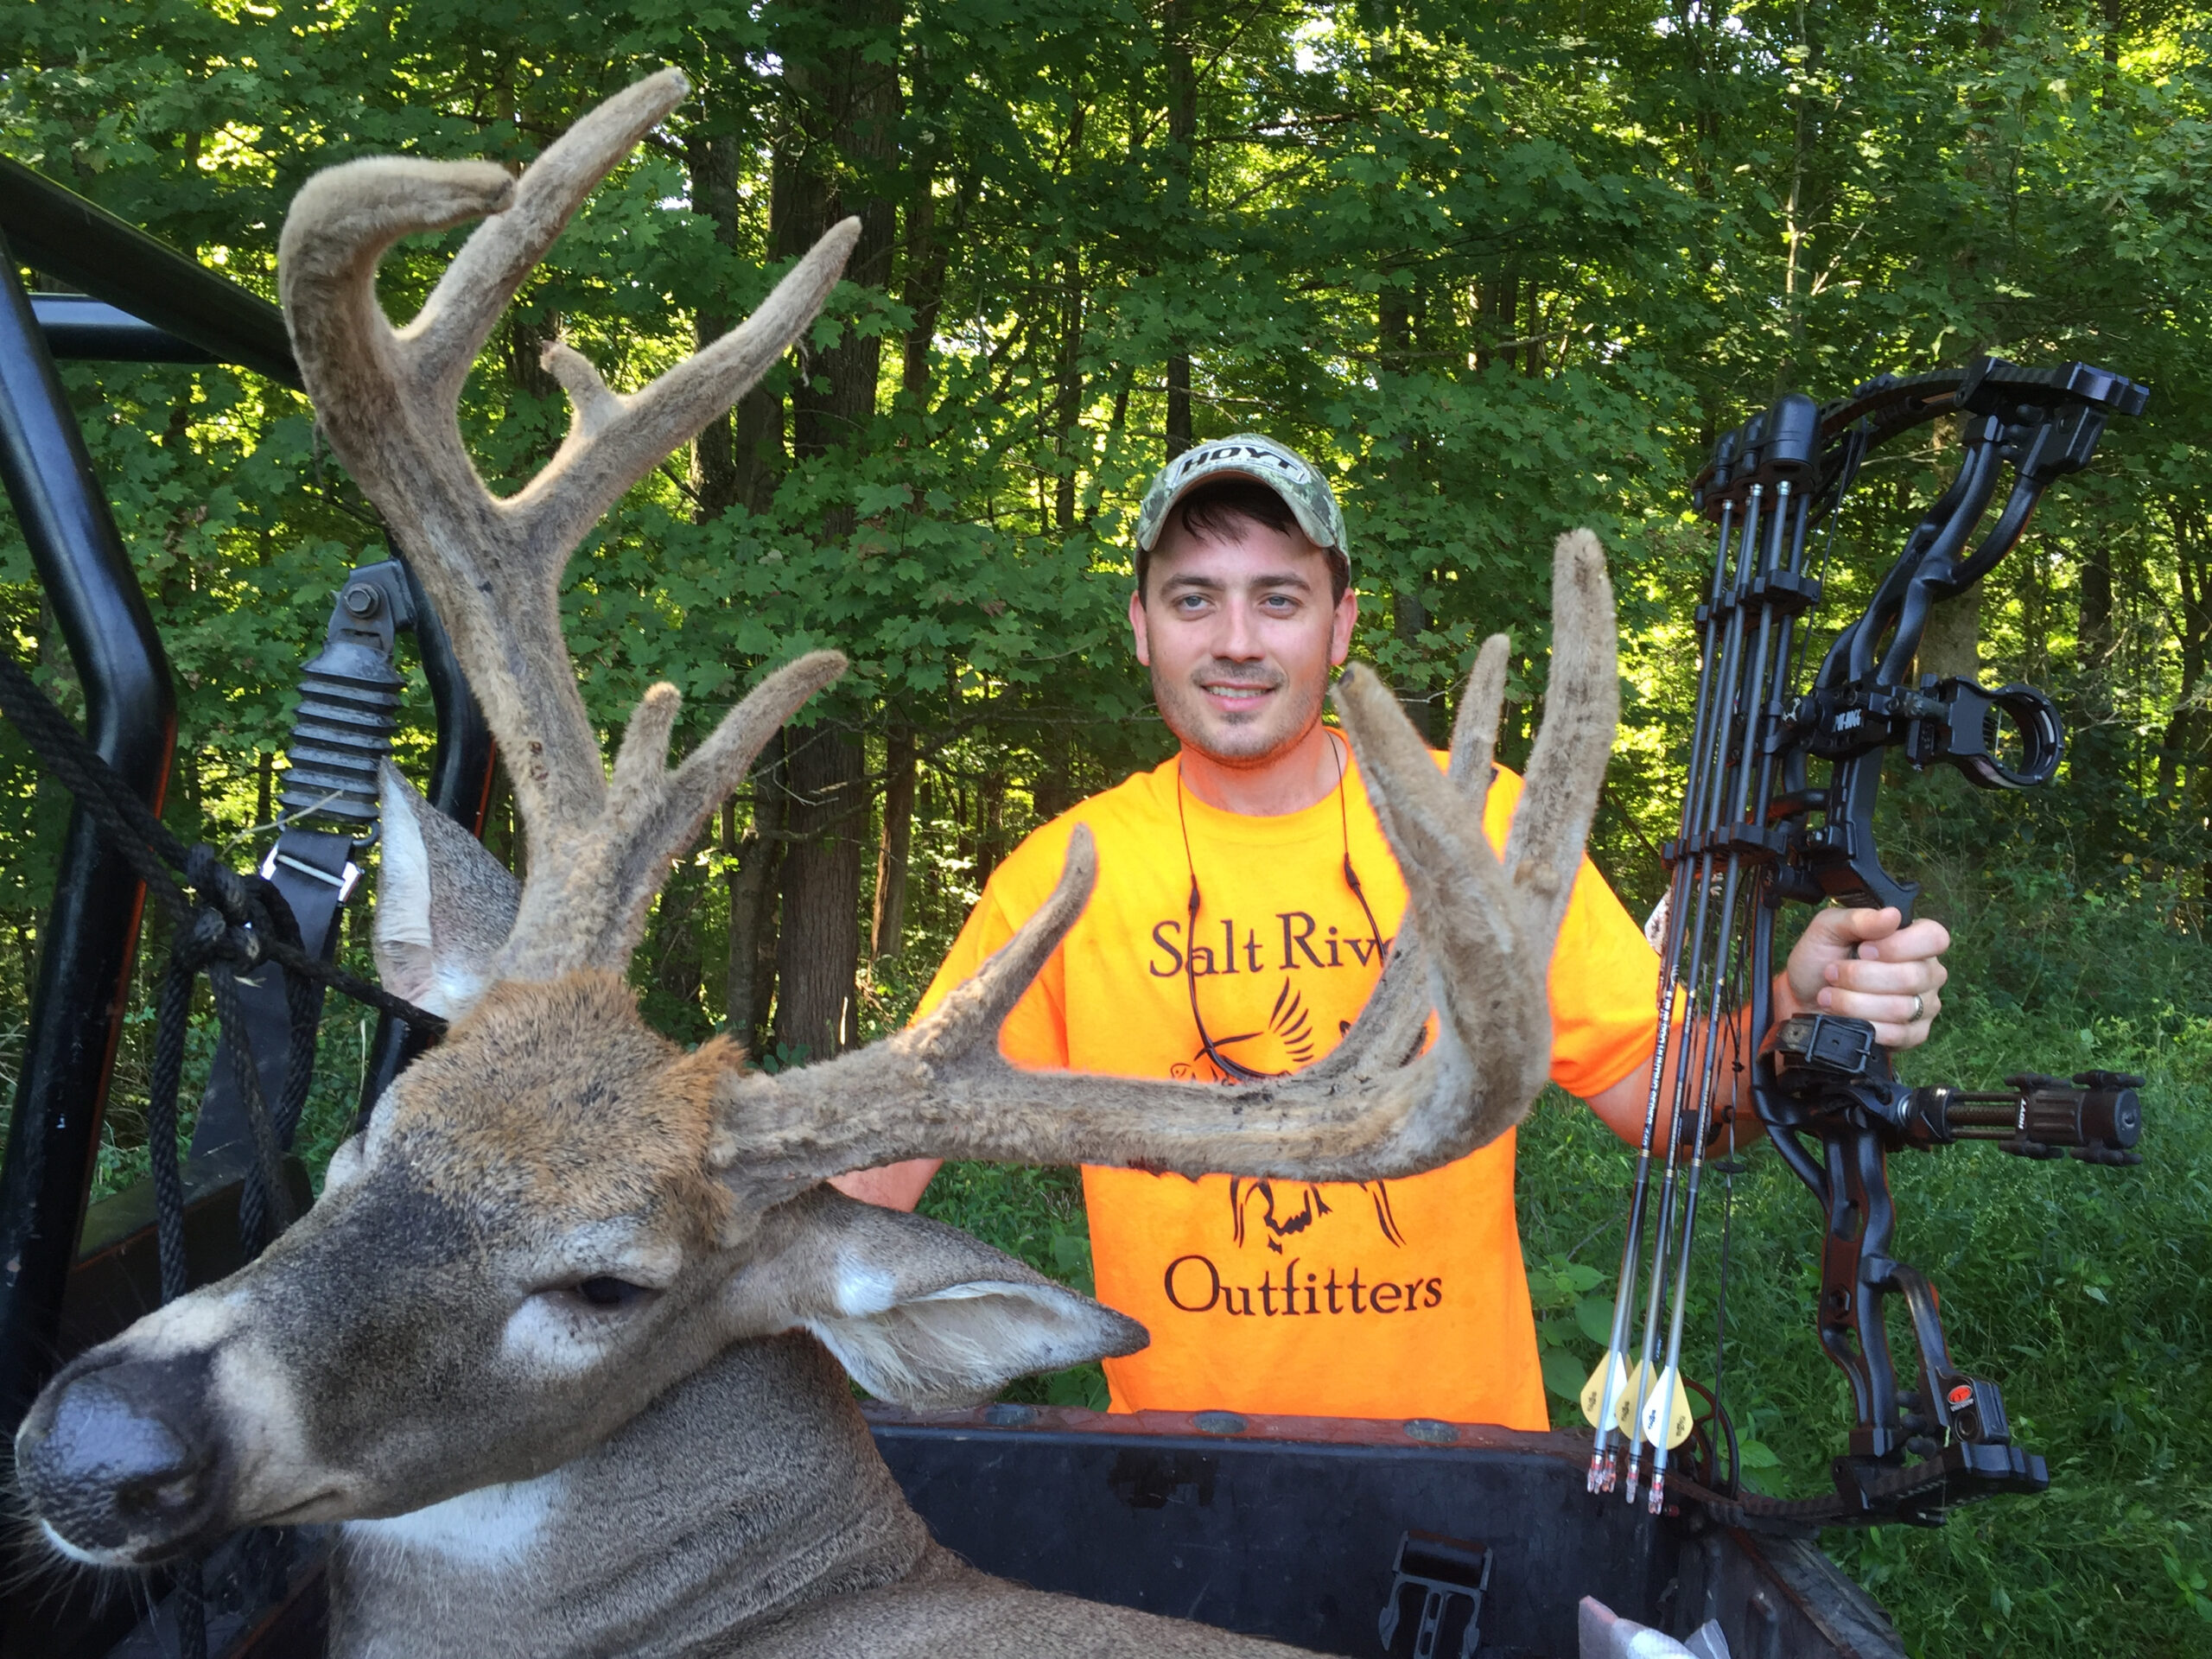 Kentucky Turkey & Deer Hunting Outfitters | Salt River